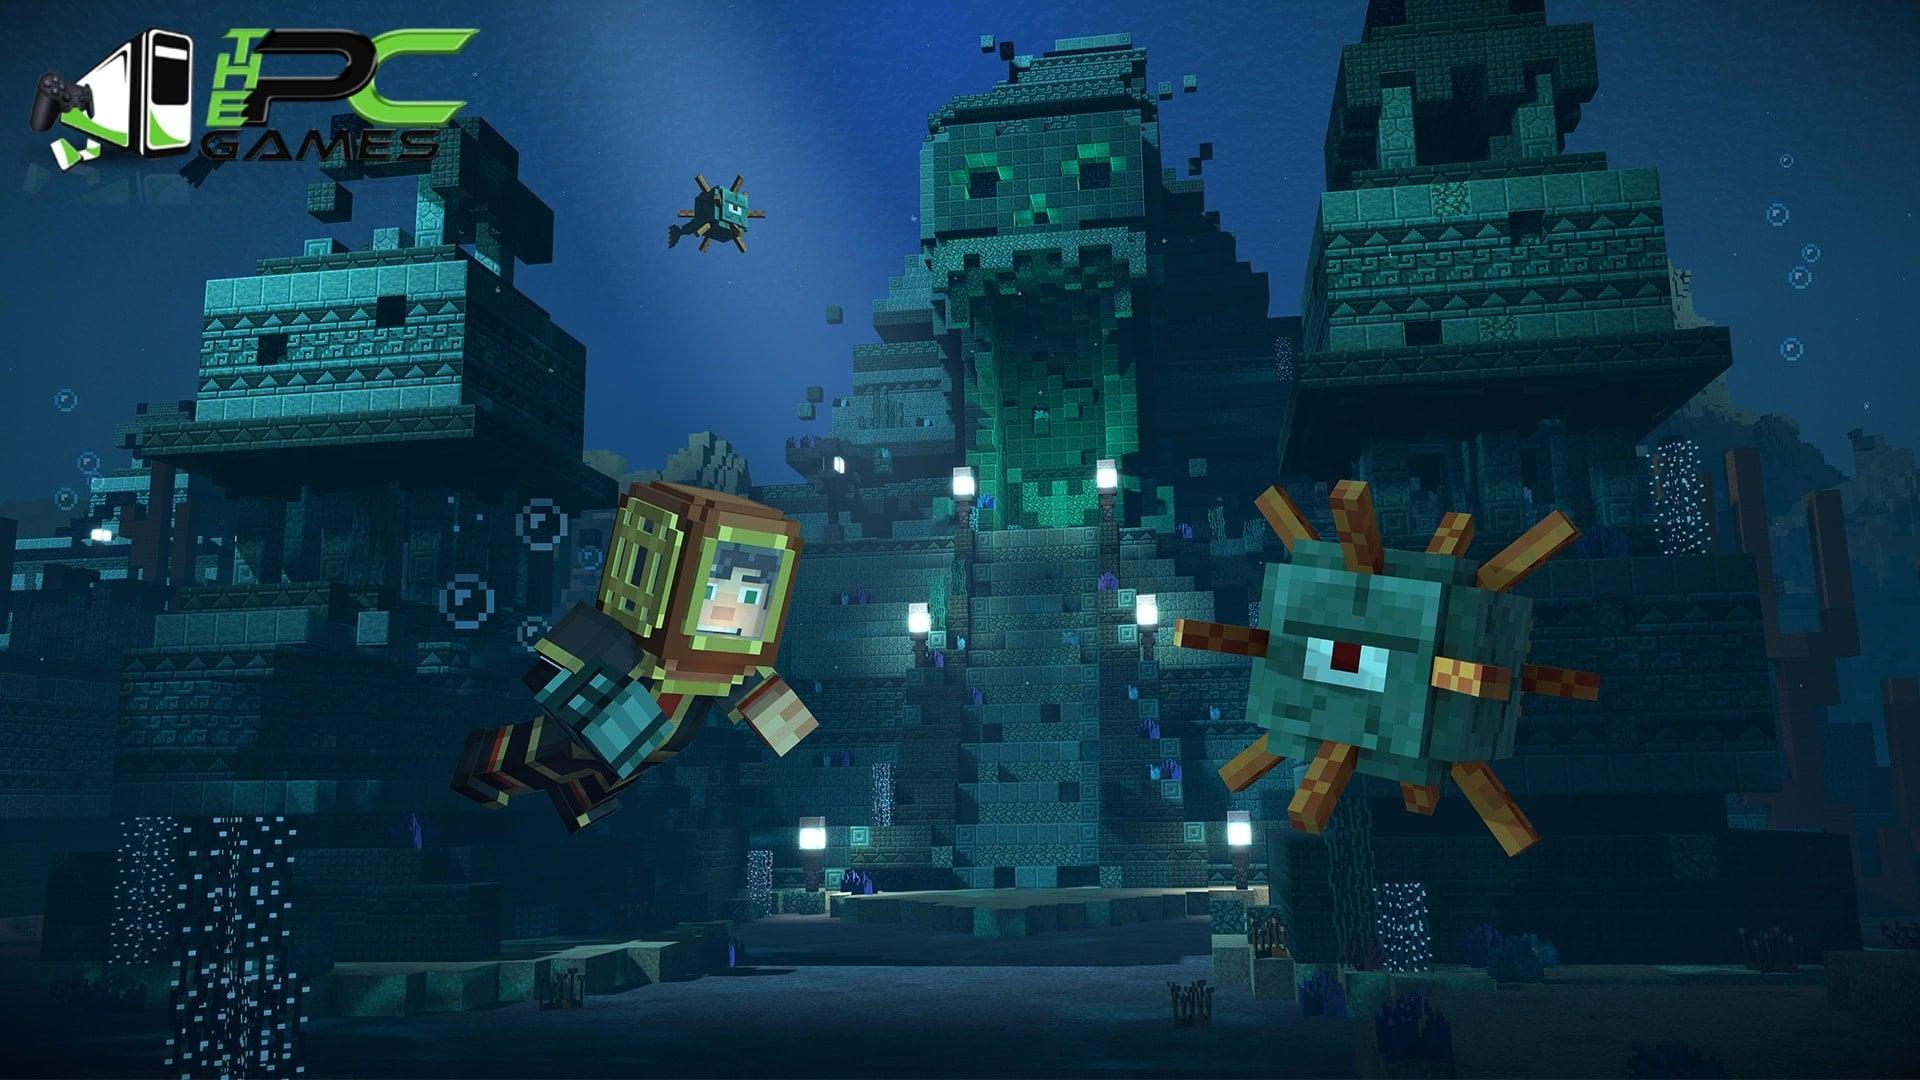 2 season download mode story free minecraft full